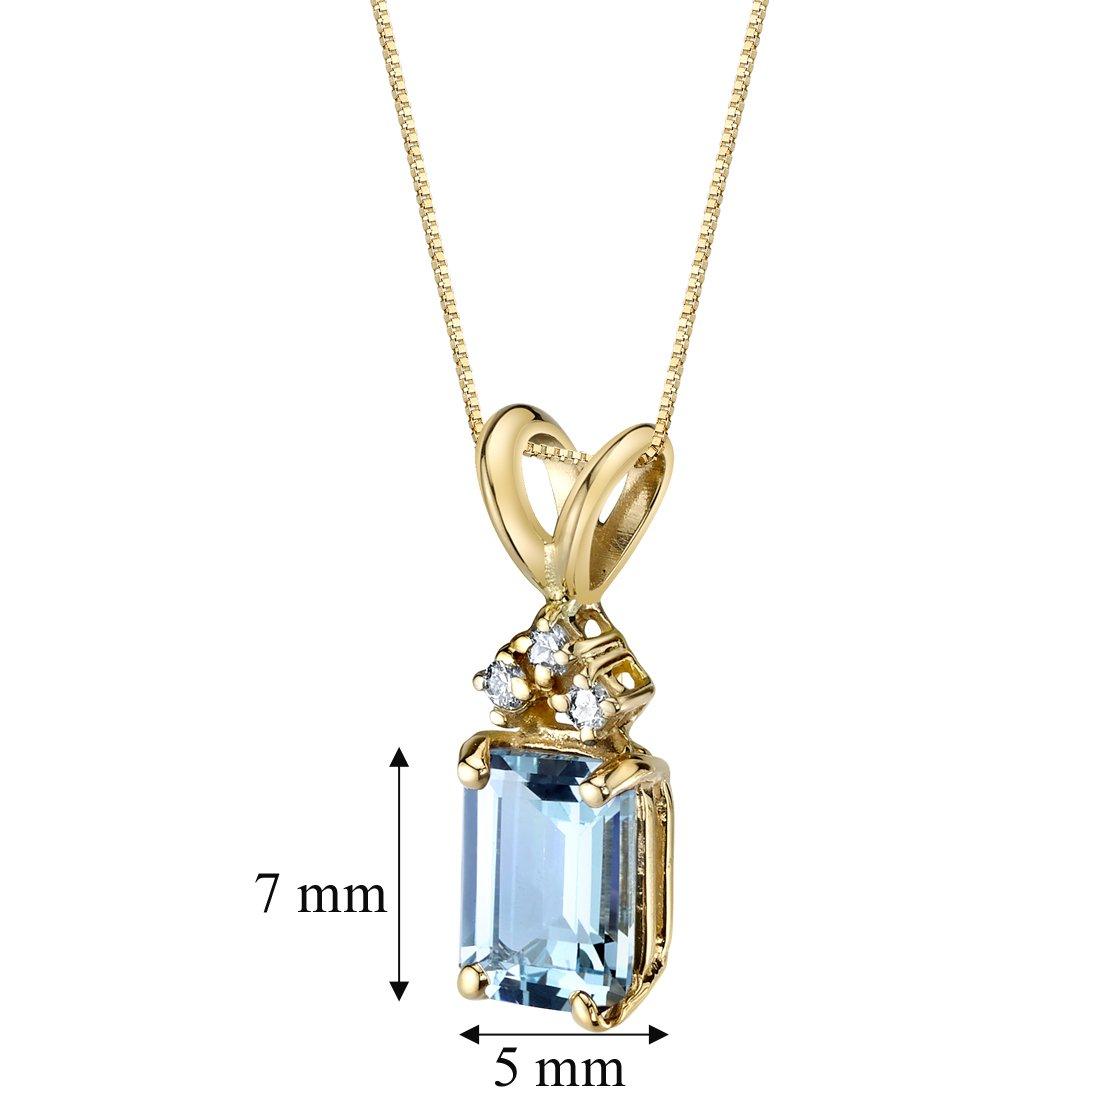 82837bc17bf Amazon.com  14 Karat Yellow Gold Emerald Cut 1.00 Carats Aquamarine Diamond  Pendant  Jewelry